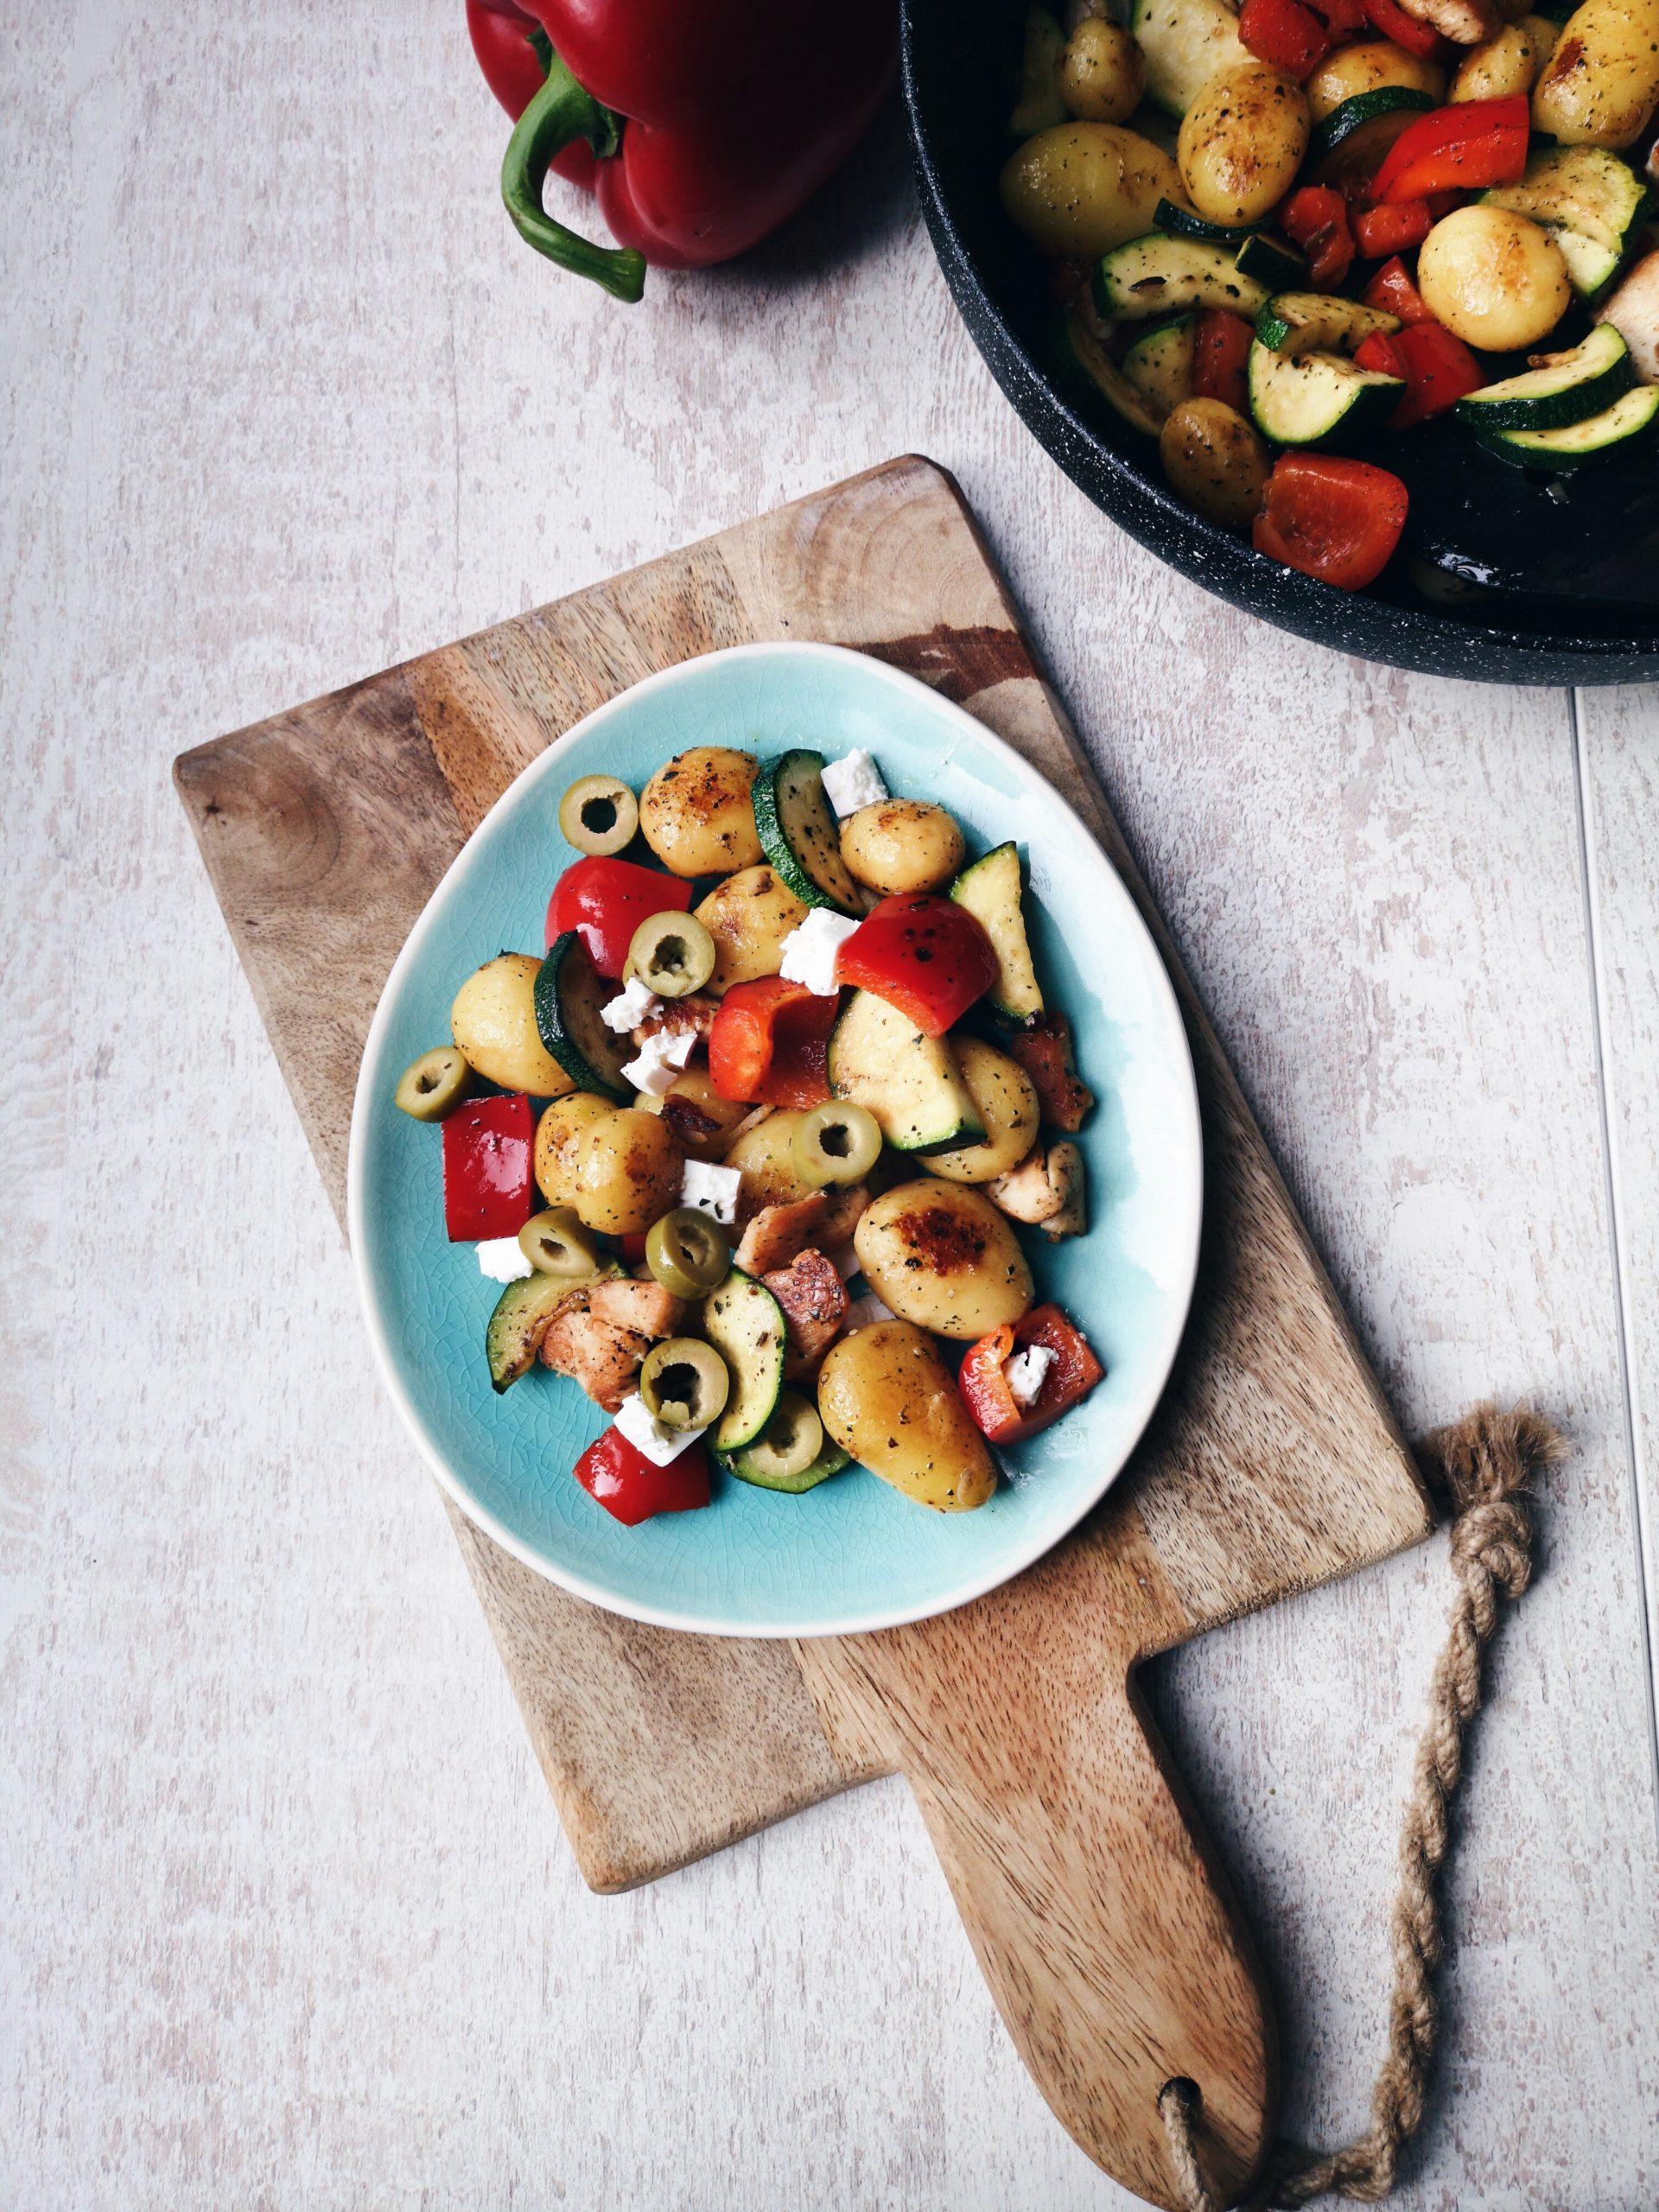 aardappel-roerbak-recept